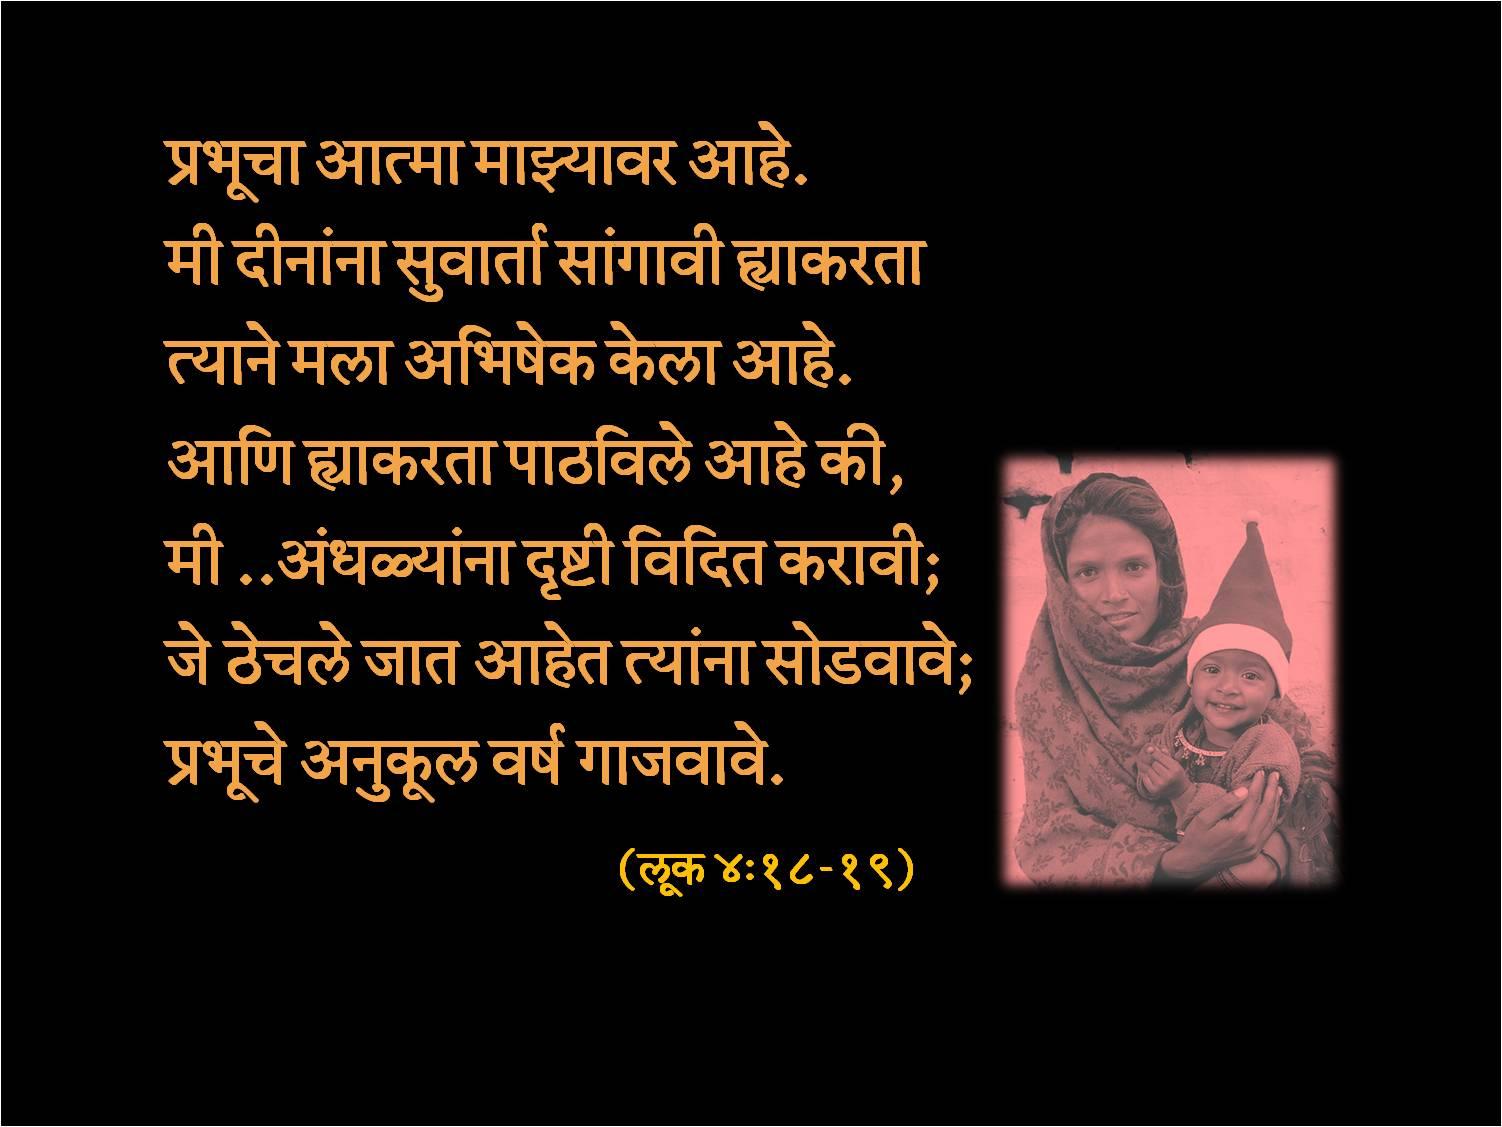 marathi bible wallpaper for - photo #28